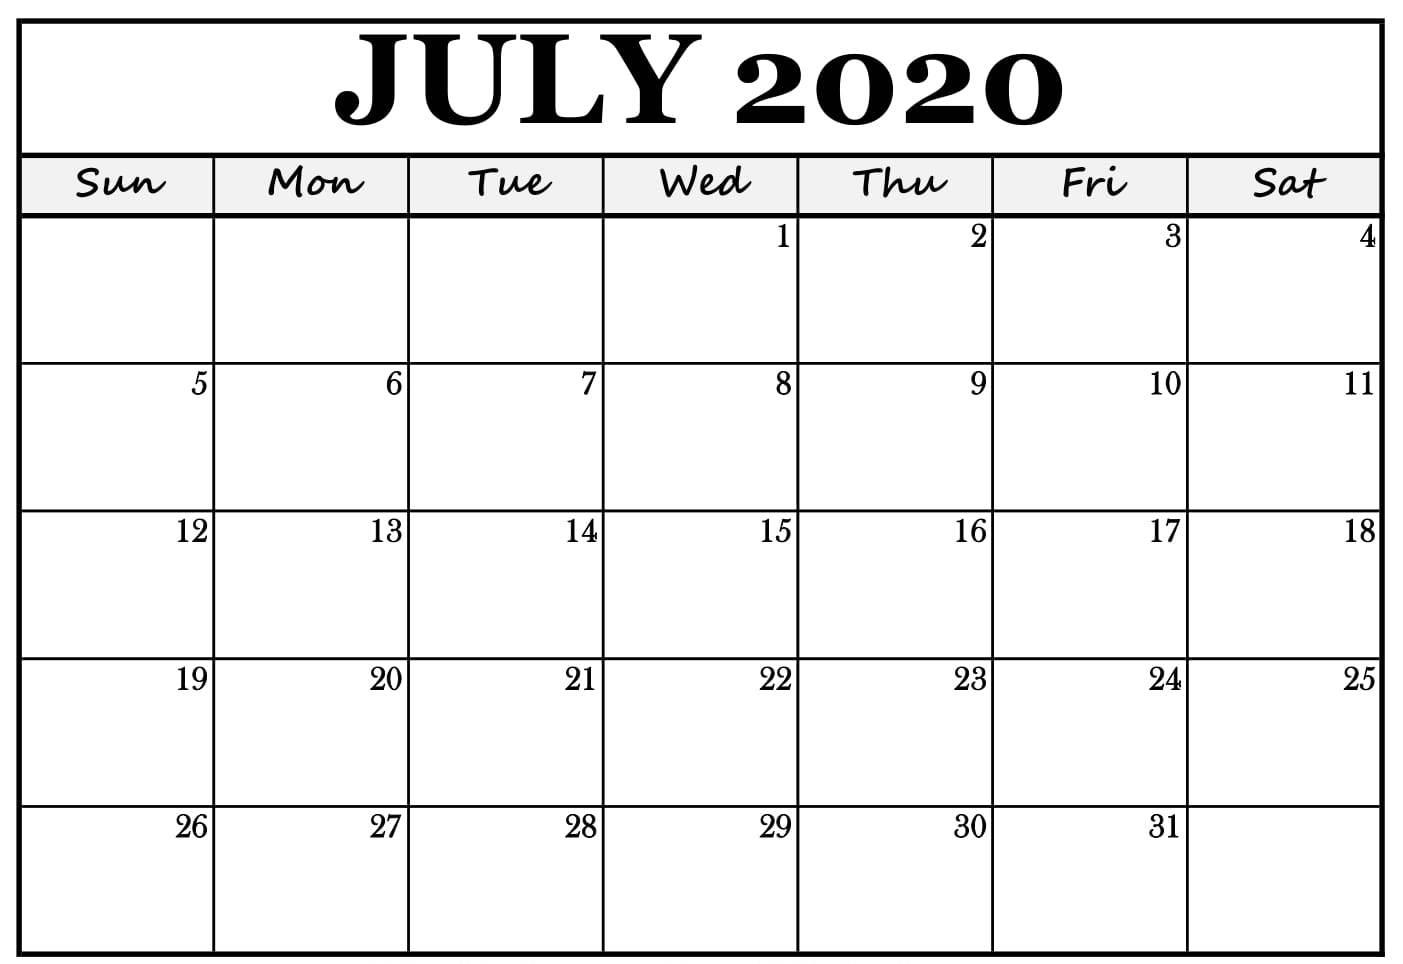 Print July 2020 Wall Calendar